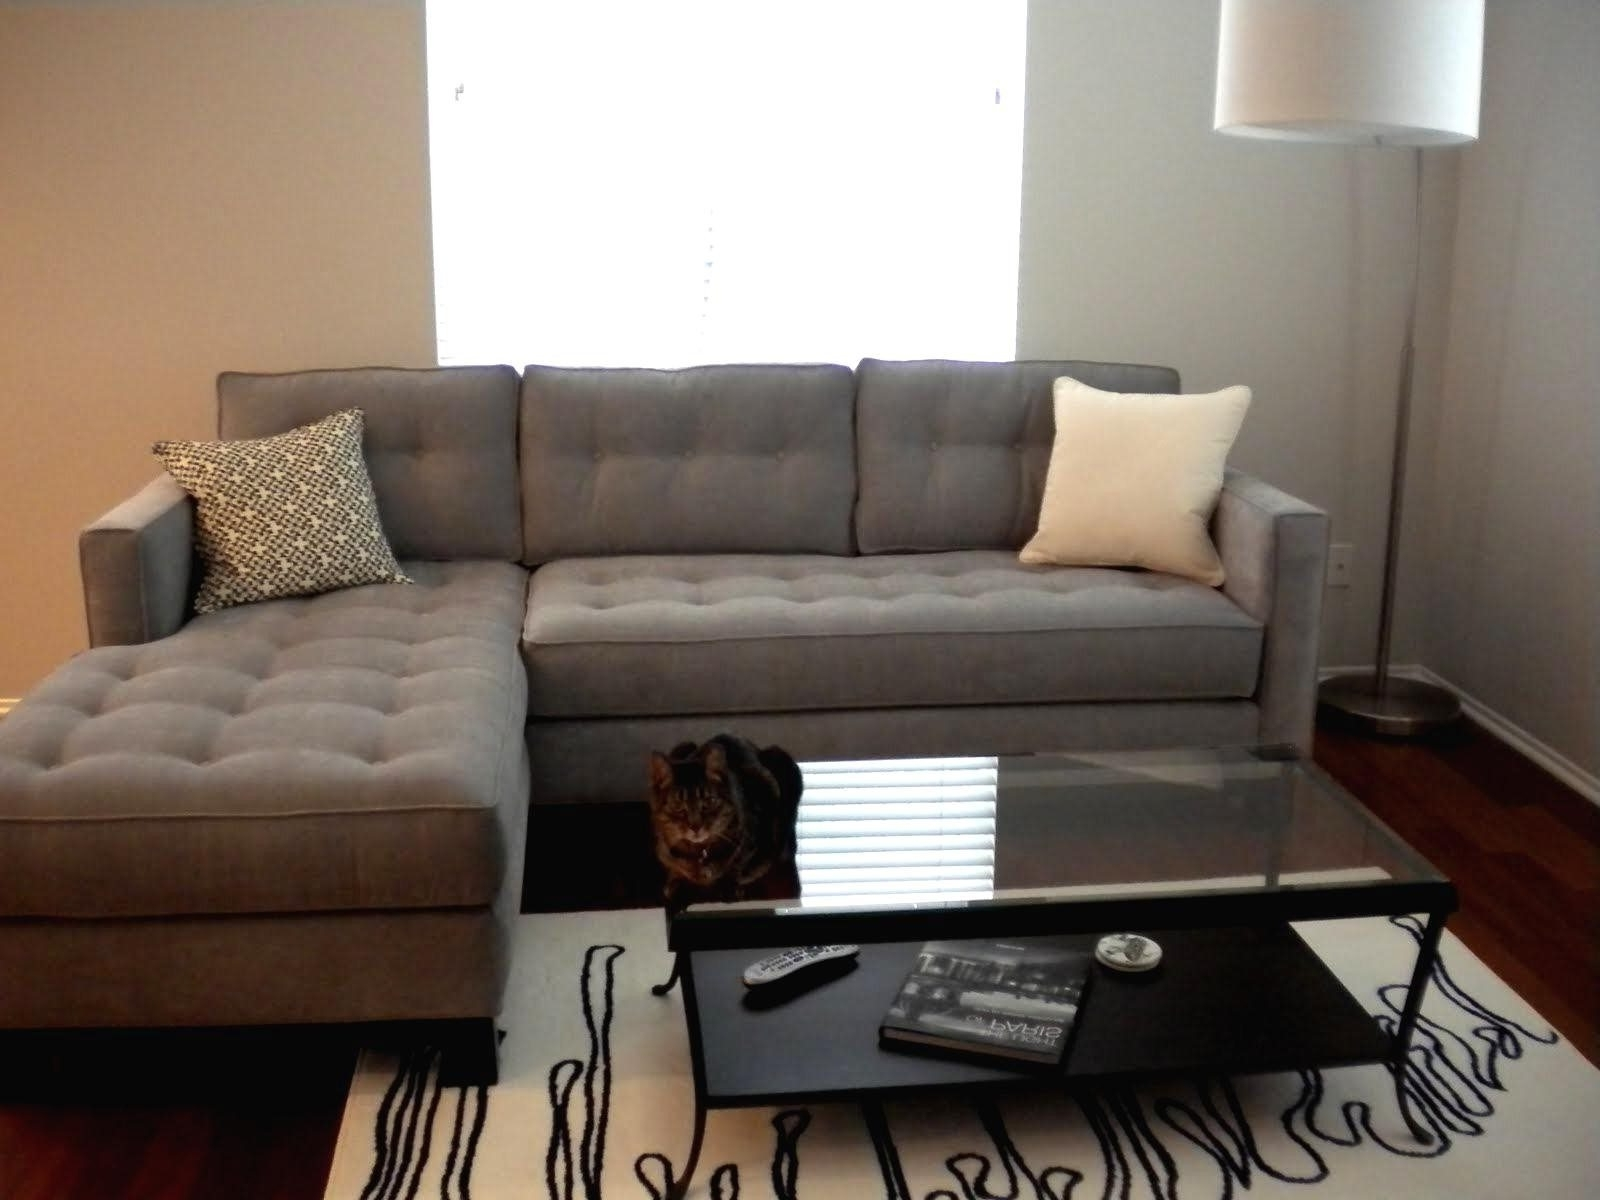 Kmart Furniture Sale